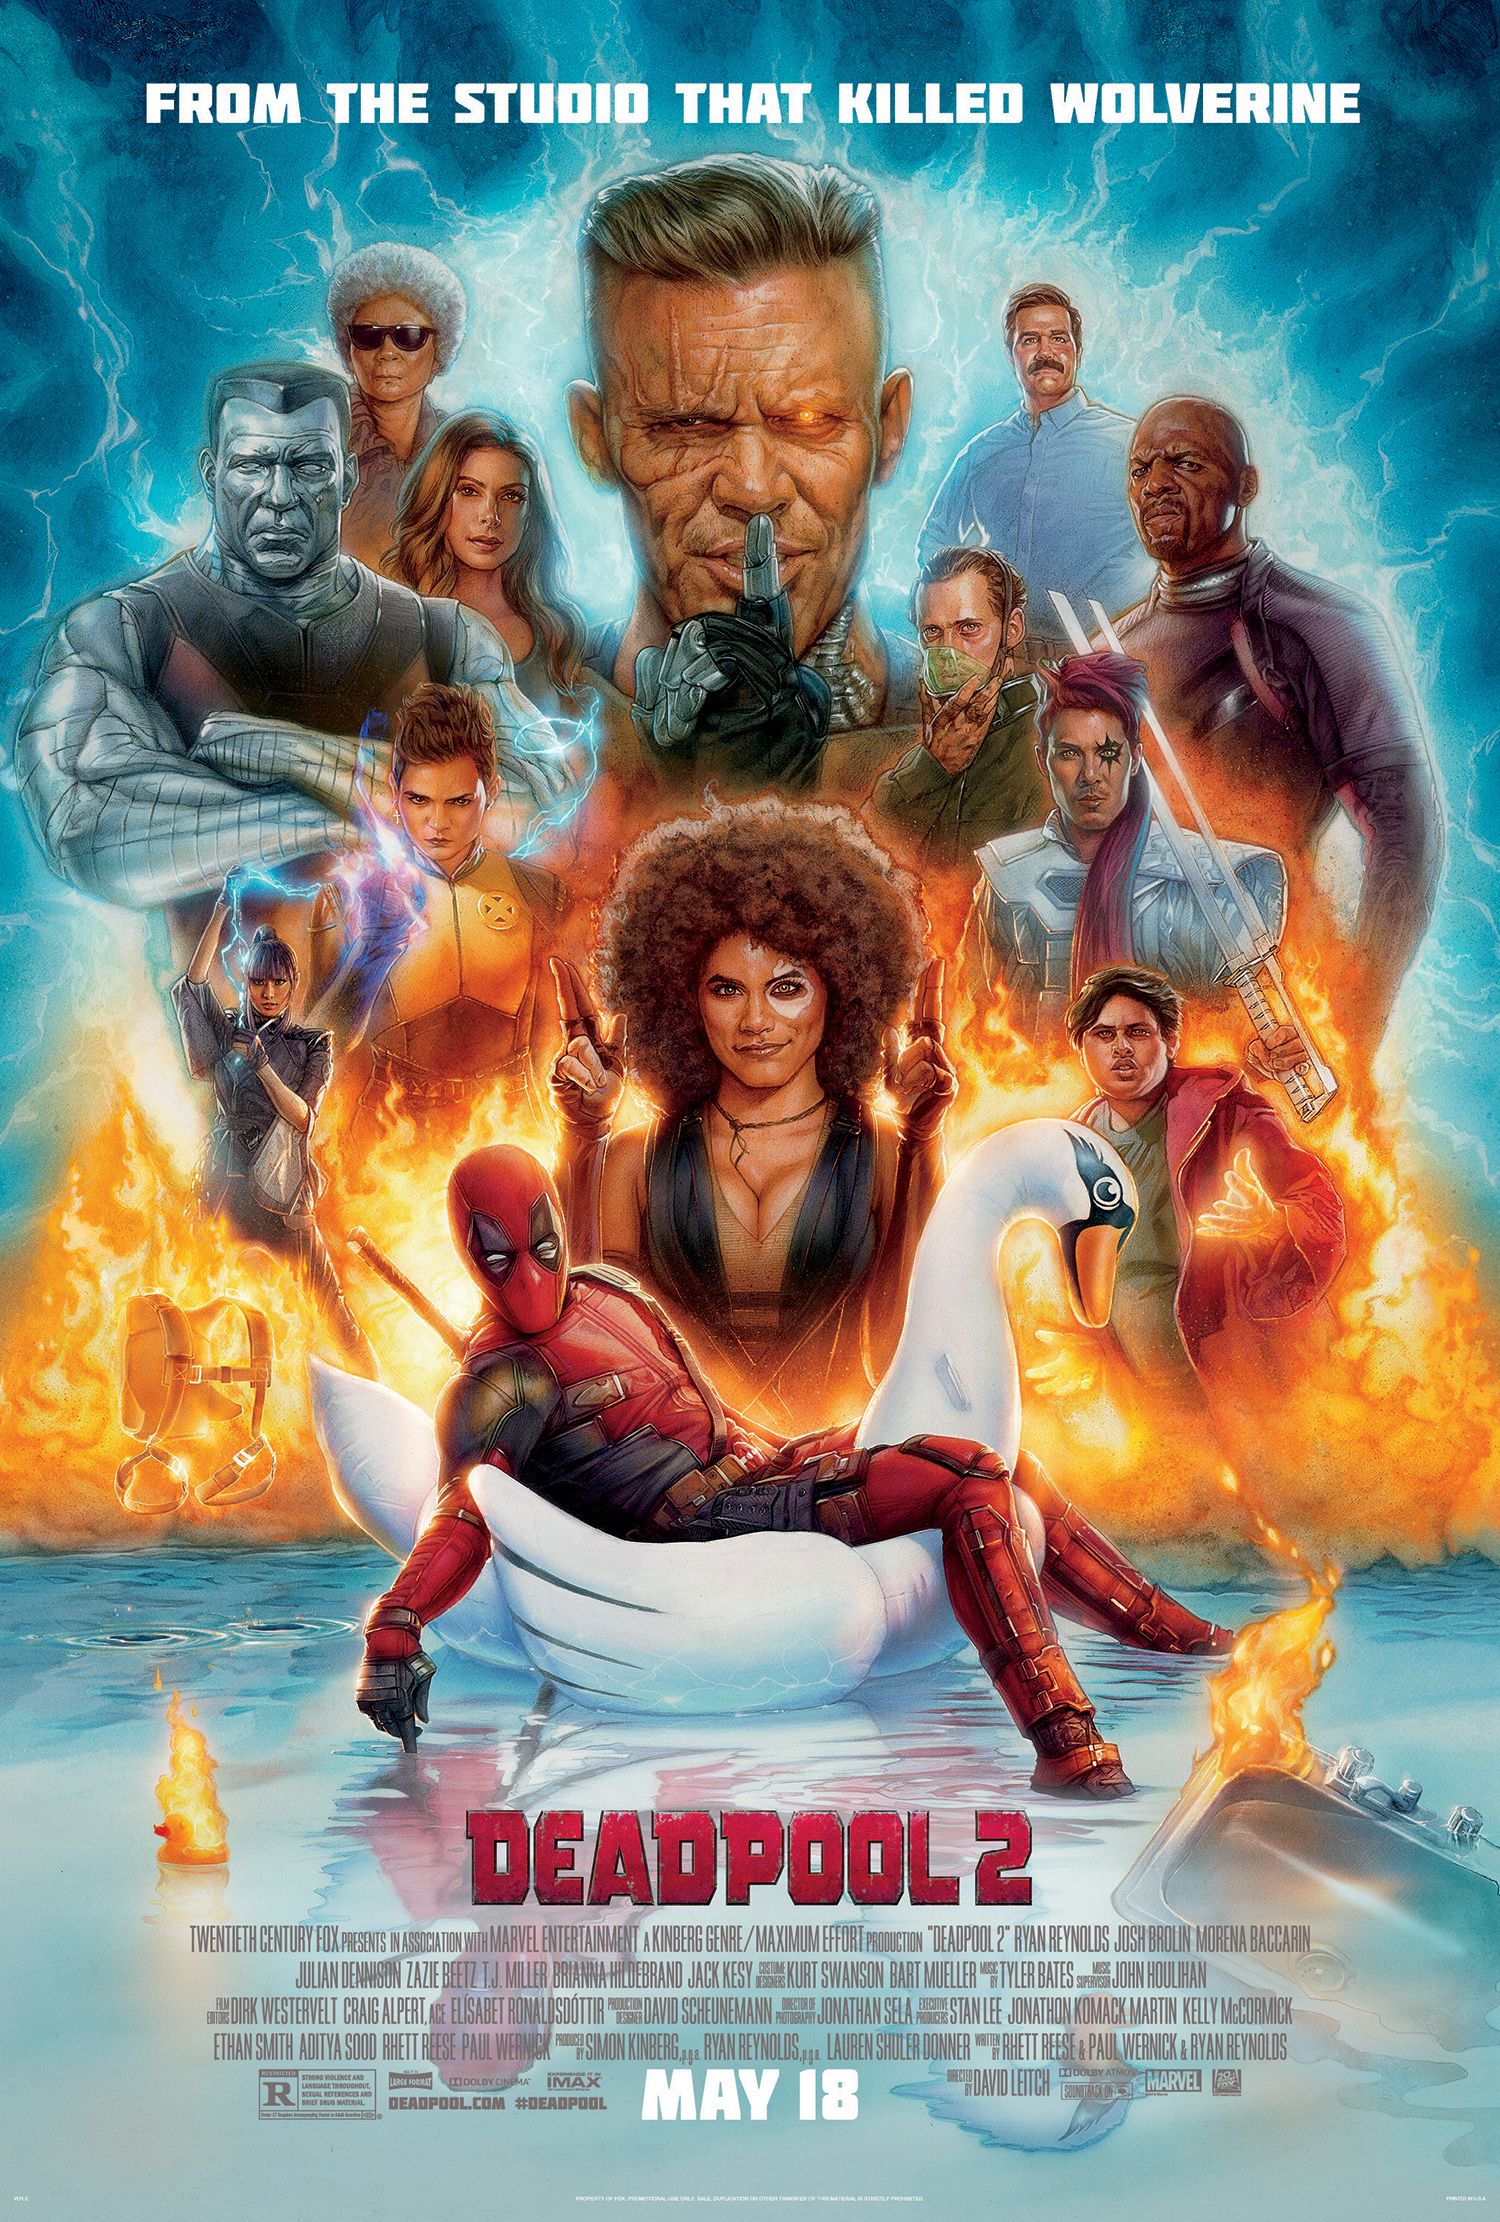 Deadpool 2 At An Amc Theatre Near You